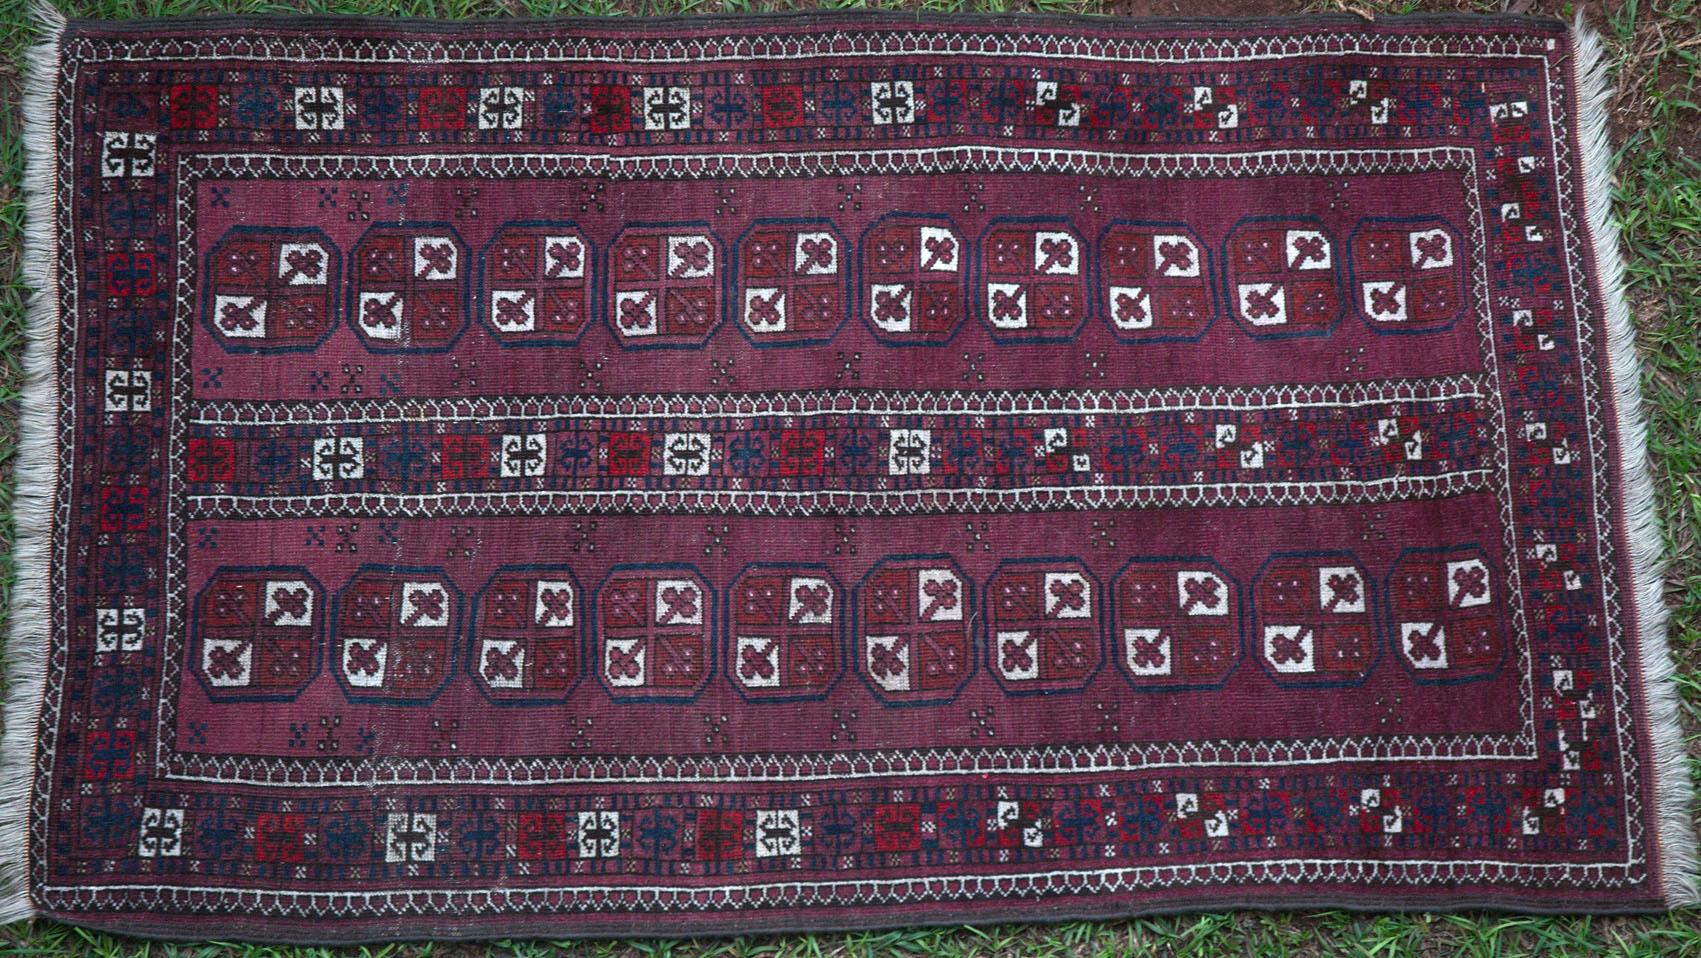 438 An Exemplary Old Turkoman Afghan Rug Www Bagface Co Uk